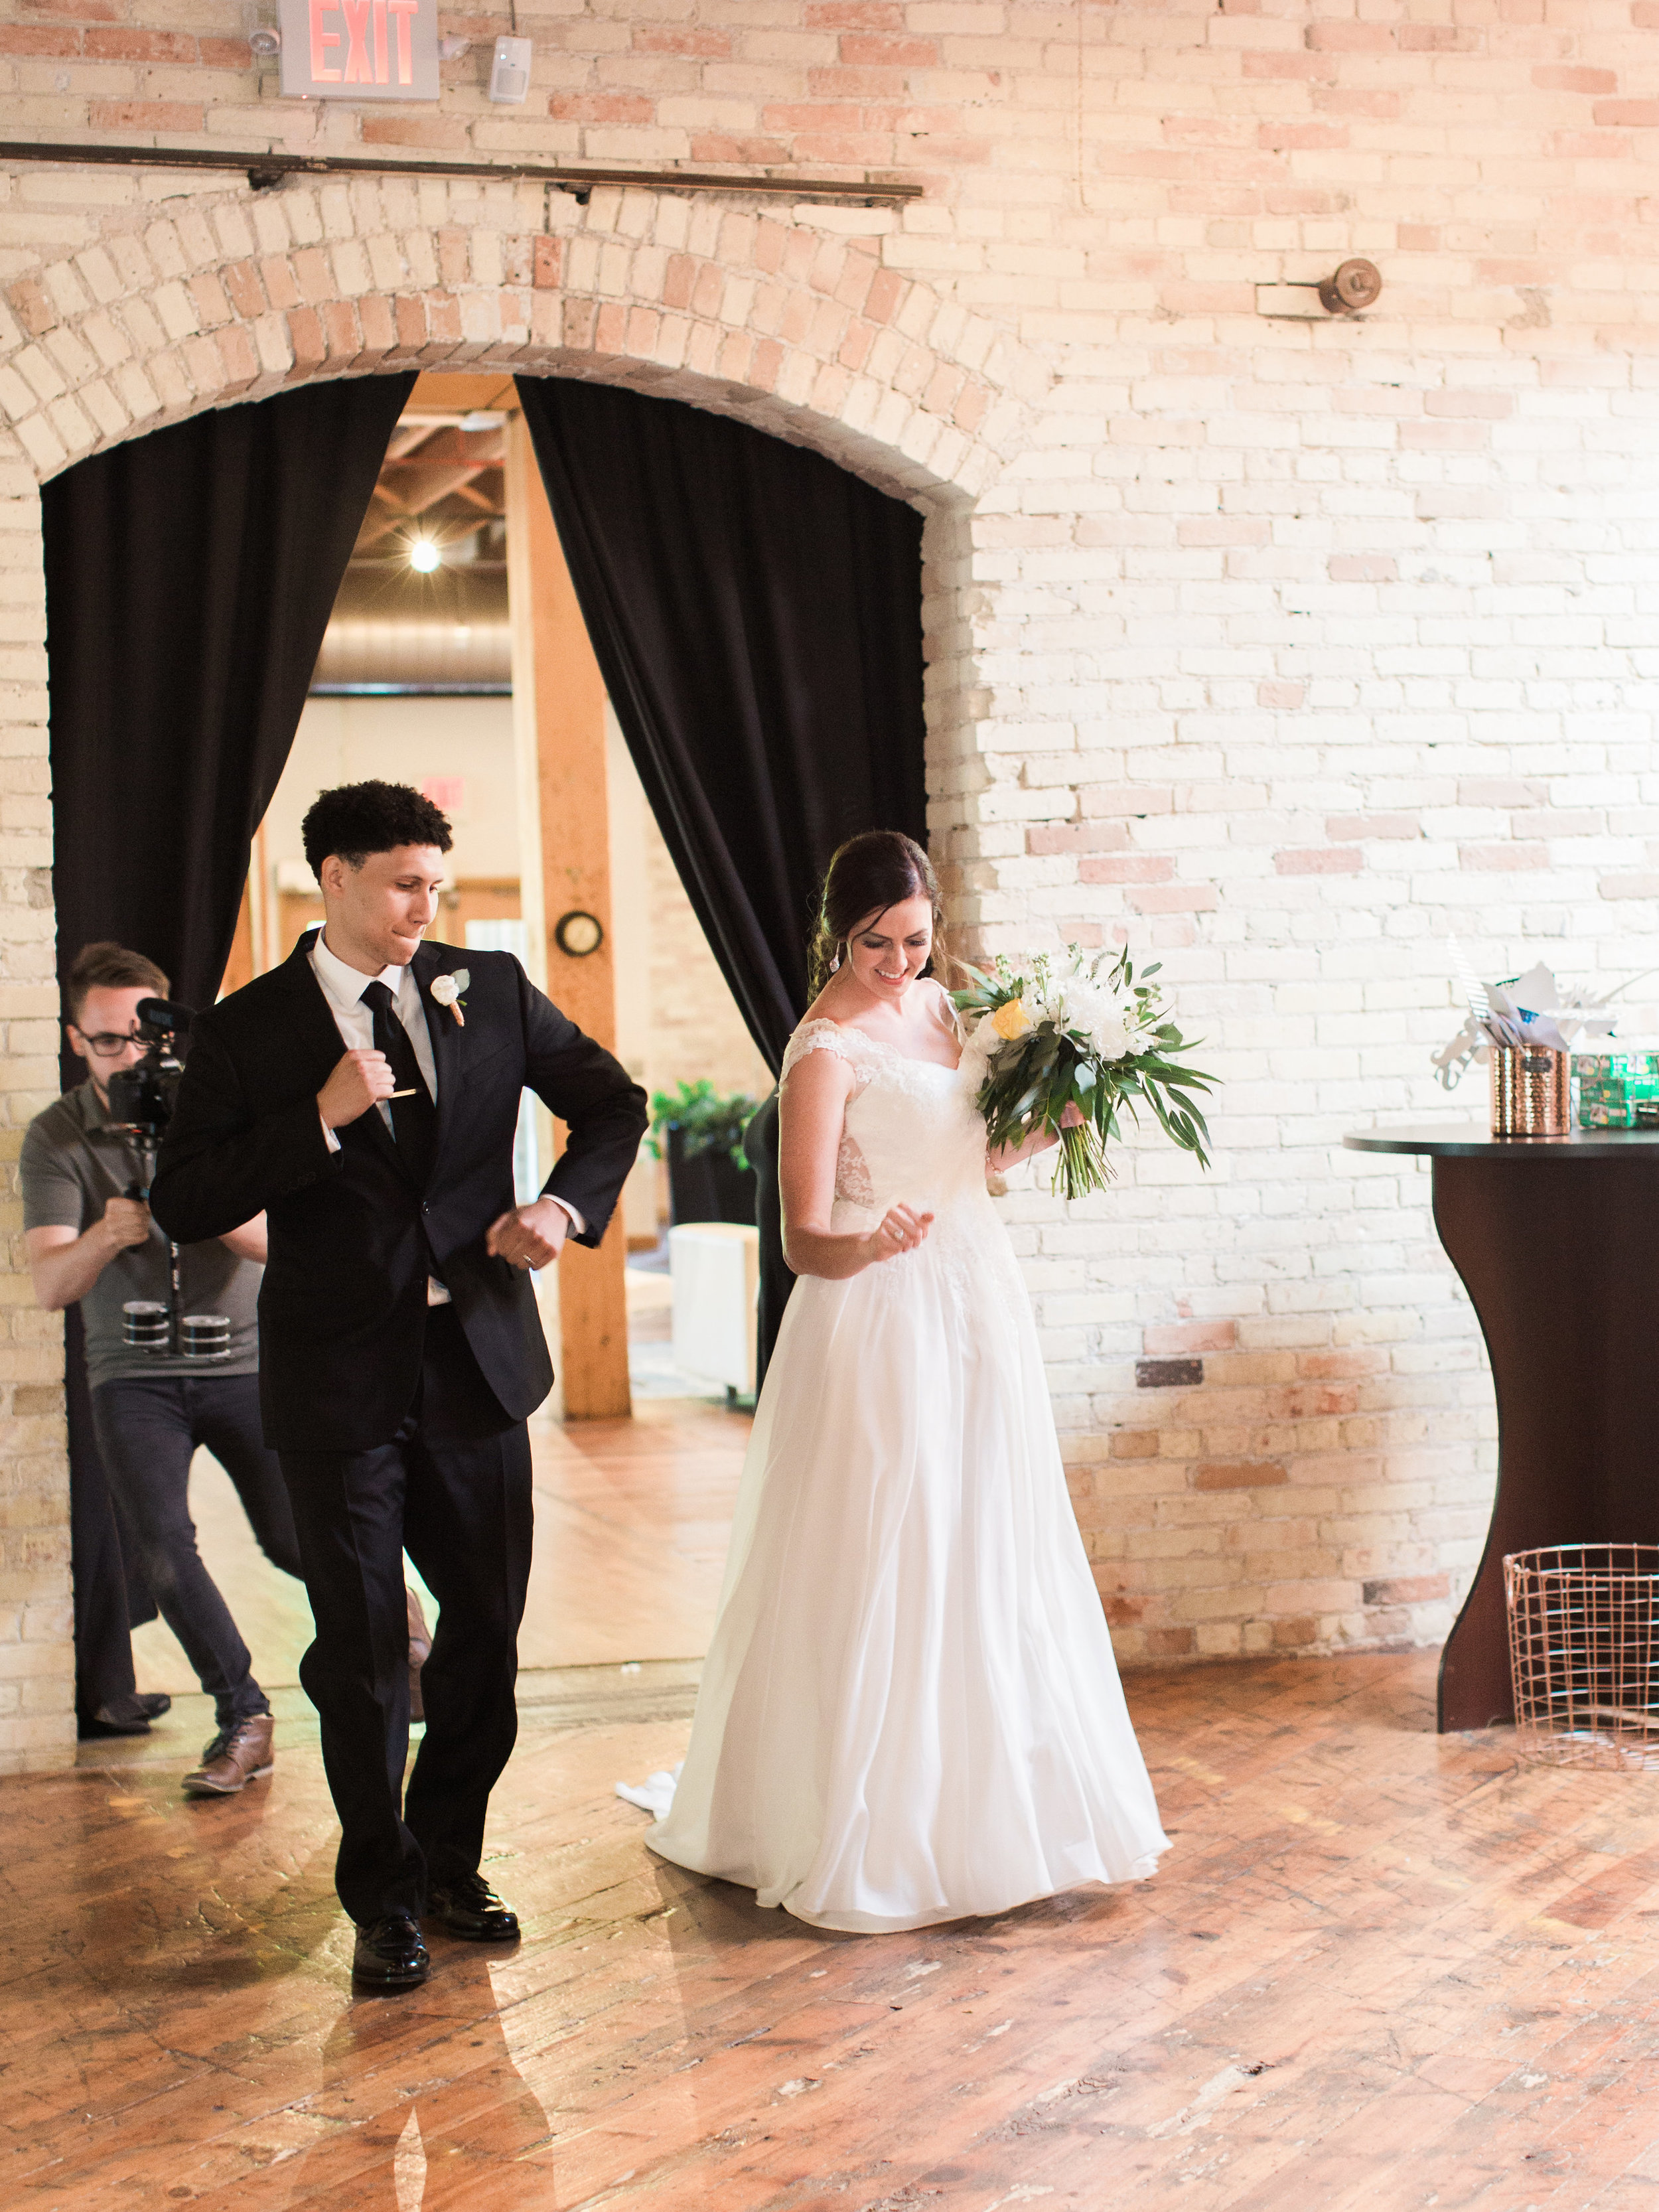 Julius+Wedding+Receptiona-40.jpg